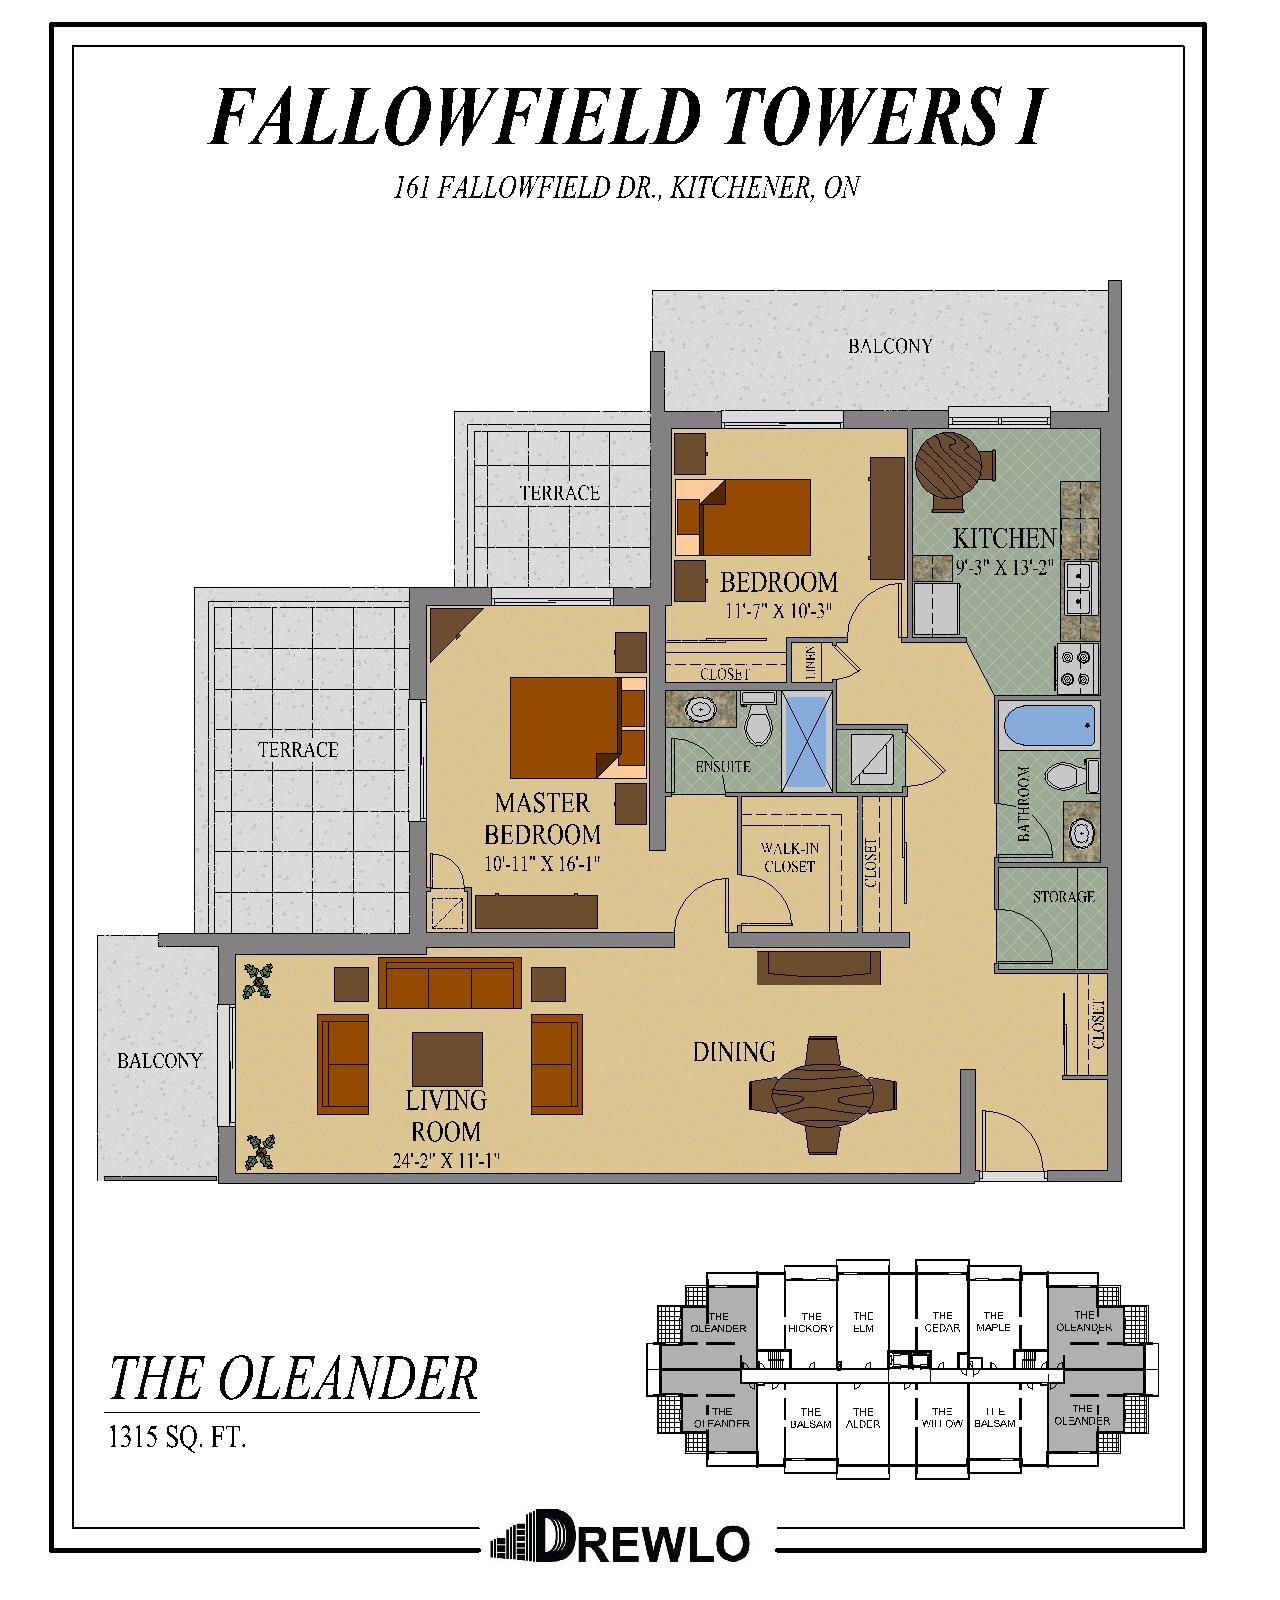 Fairview Mall Floor Plan: Kitchener Apartment Rentals